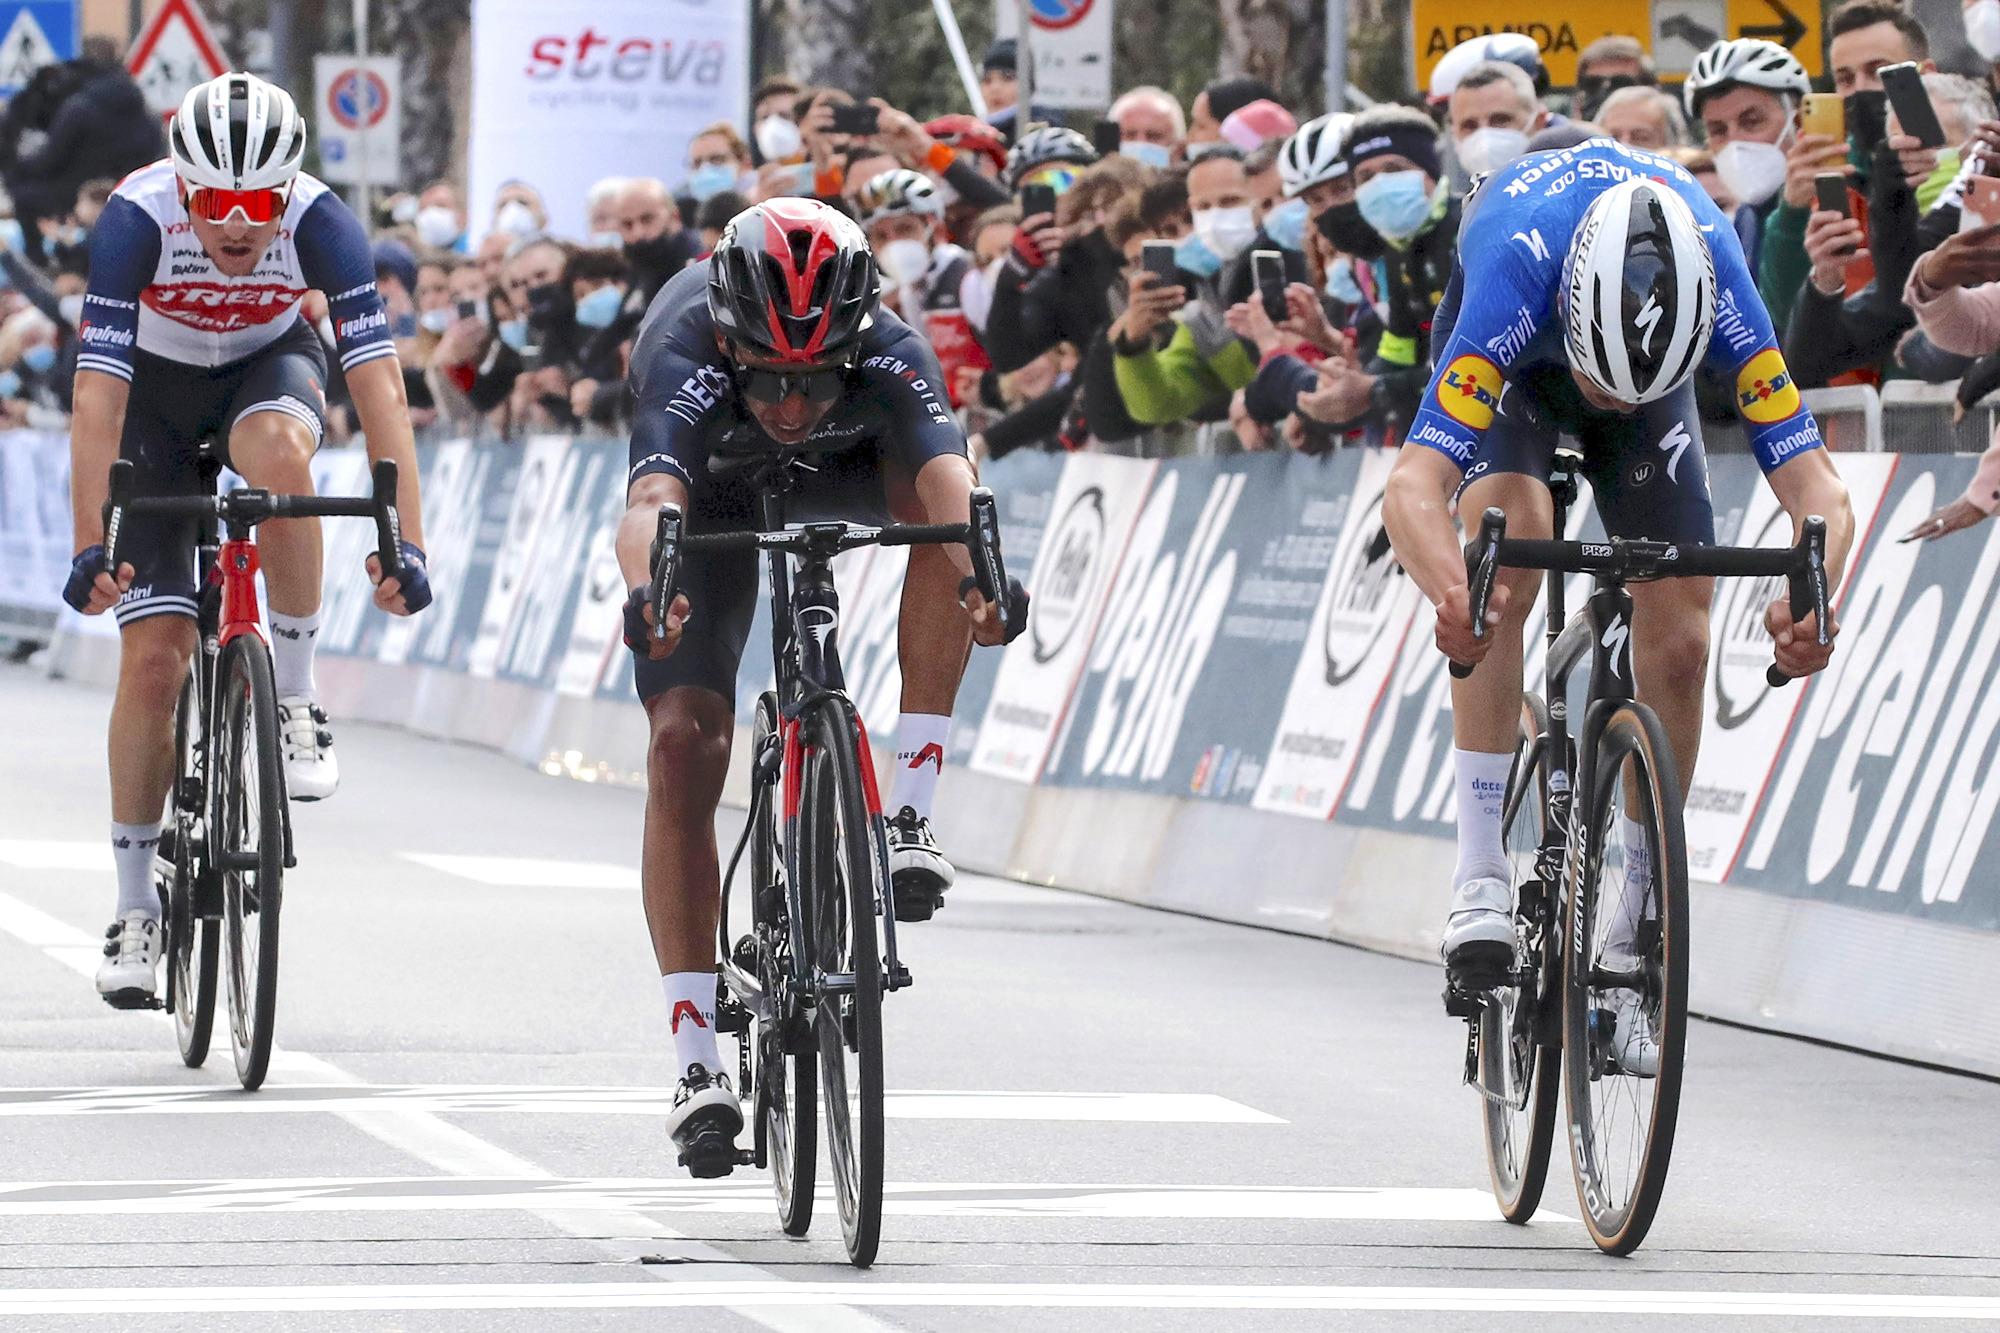 Trofeo Laigueglia 2021 - 58th Edition - Laigueglia - Laigueglia 202 km - 03/03/2021 - Egan Bernal (COL - Ineos Grenadiers) - Mauri Vansevenant (BEL - Deceuninck - Quick-Step) - photo Roberto Bettini/BettiniPhoto©2021